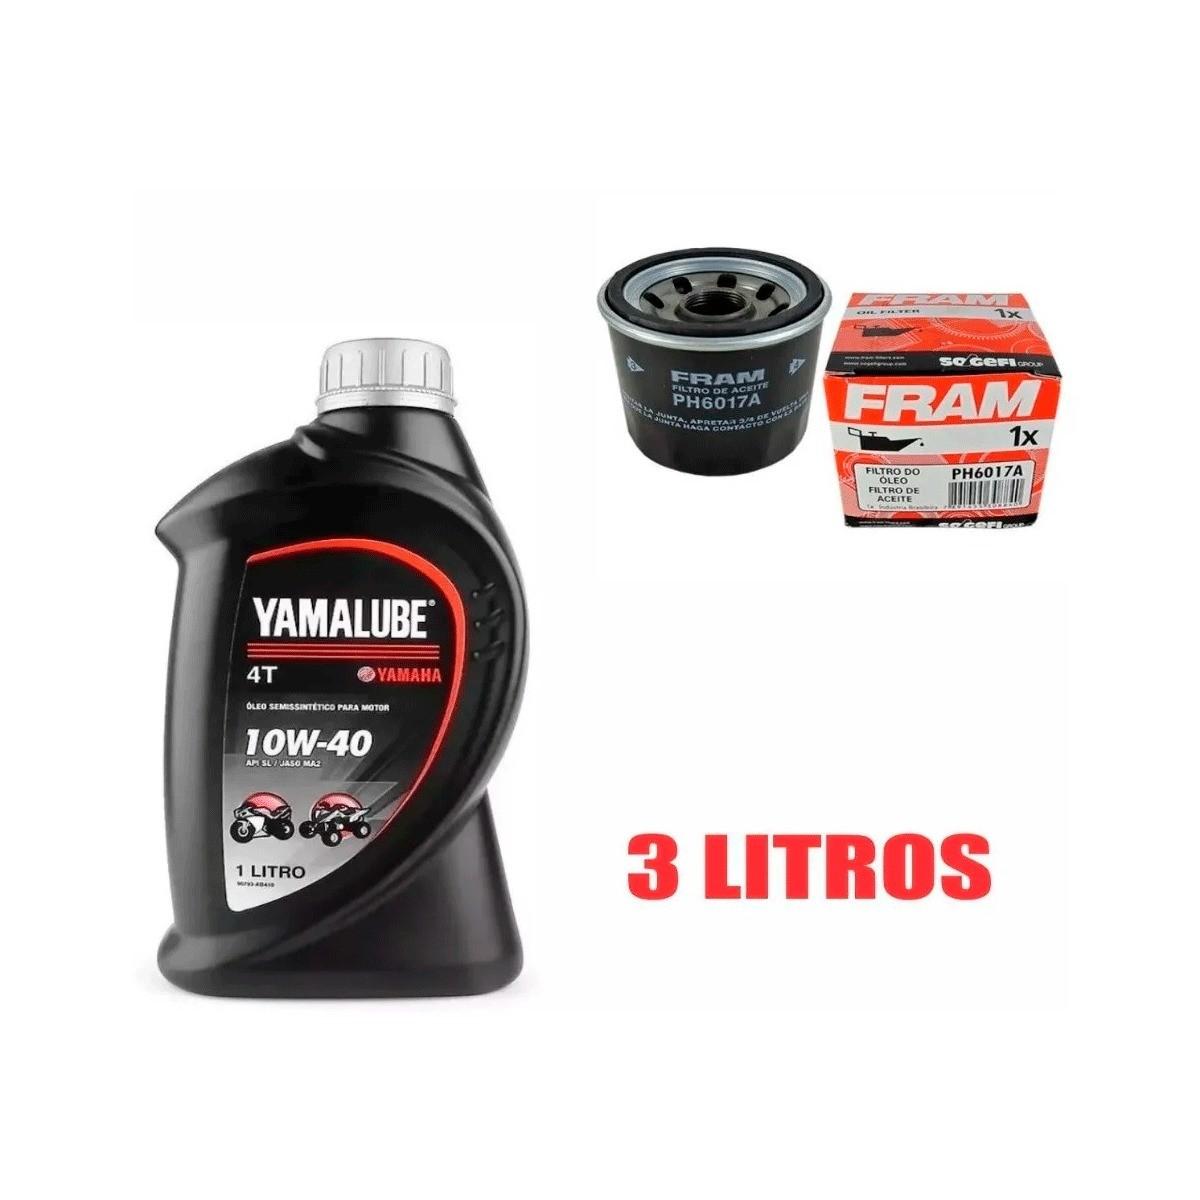 Kit Troca Oleo E Filtro Yamaha Xj6 Yamalube 10w40